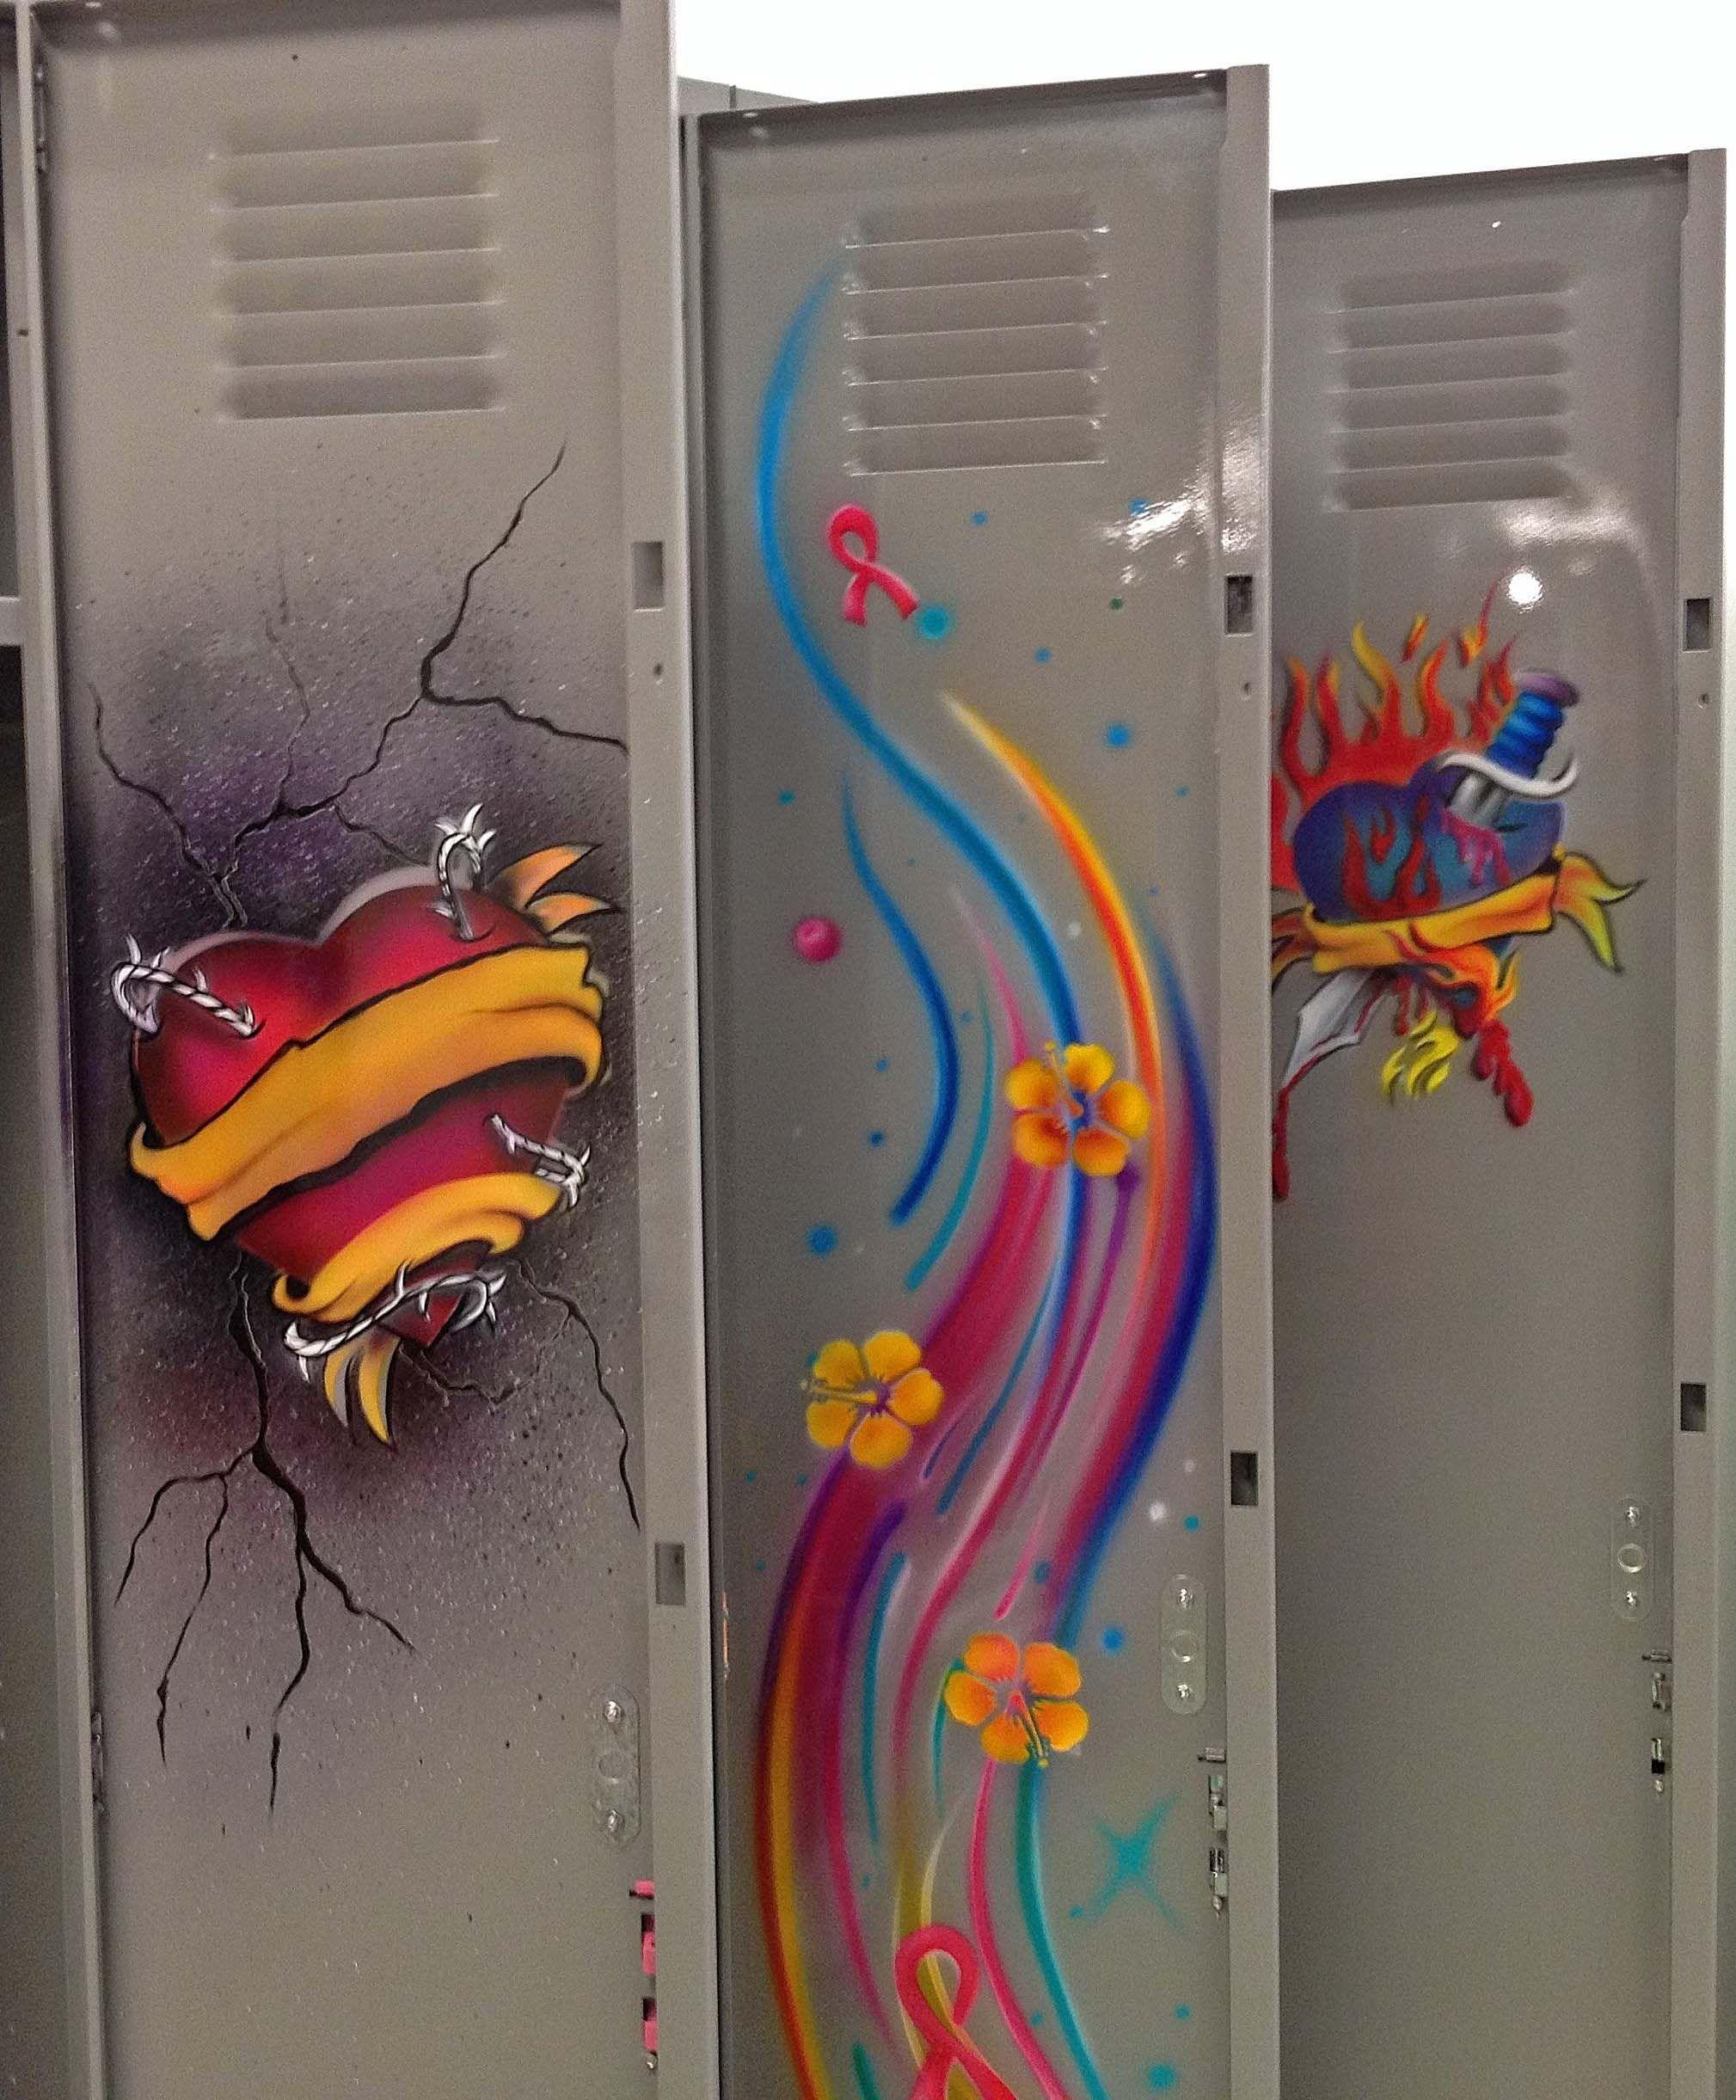 inside door artwork on the triple | Lockers | Pinterest | Inside doors Lockers and Doors & inside door artwork on the triple | Lockers | Pinterest | Inside ... pezcame.com